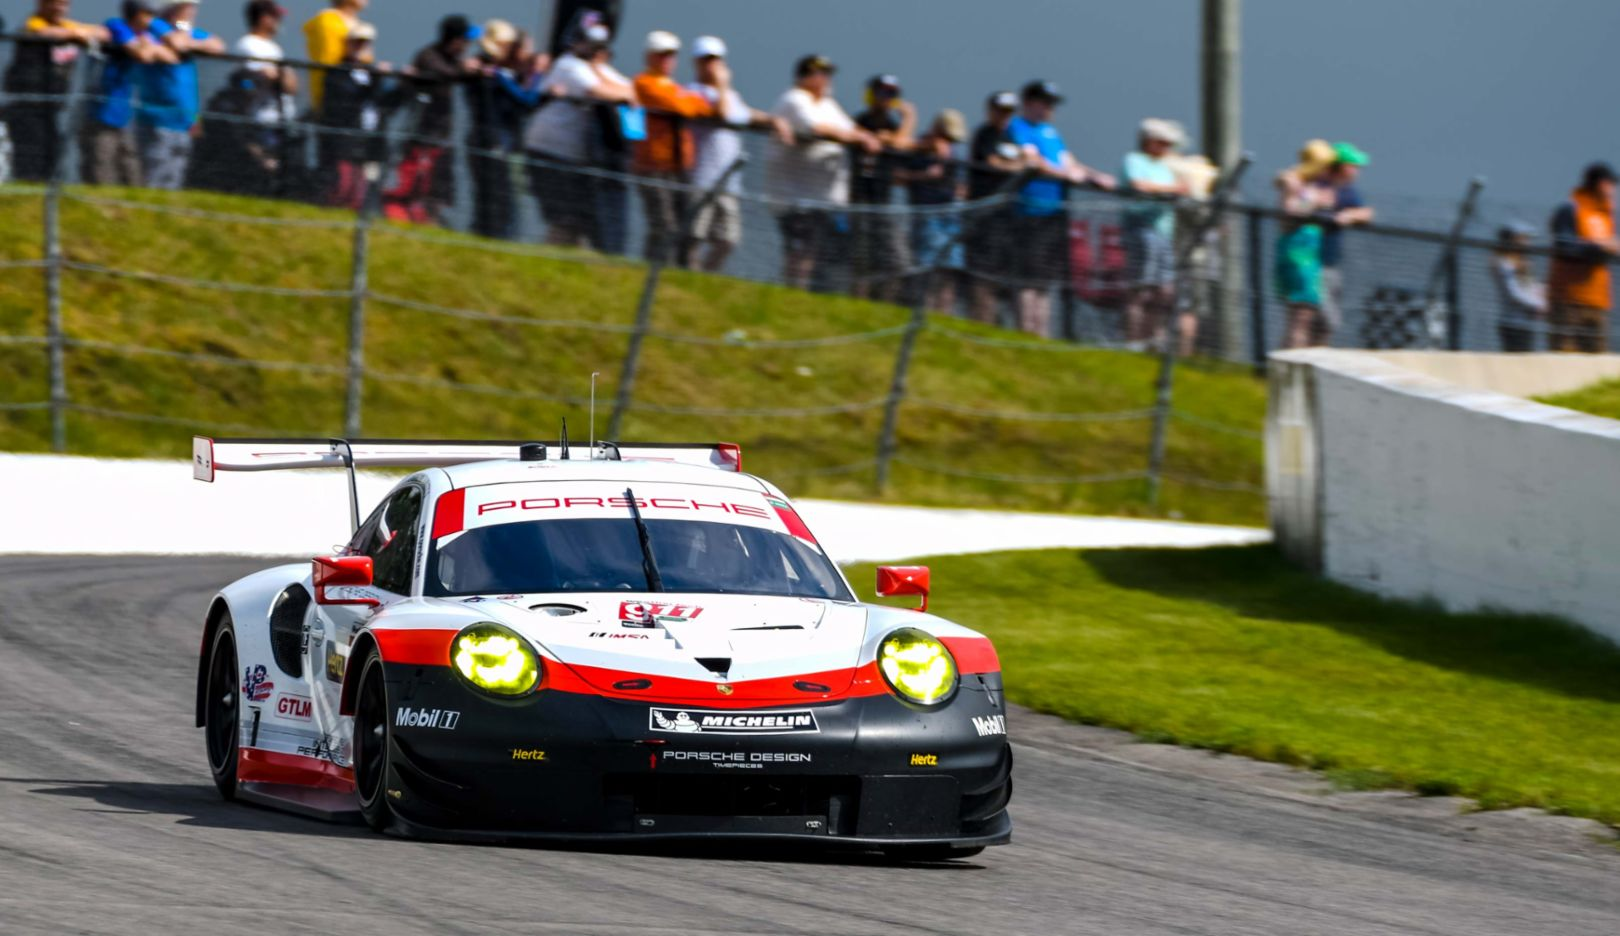 911 RSR, IMSA WeatherTech Sportscar Championship, Race 6, Bowmanville/ Kanada, 2017, Porsche AG